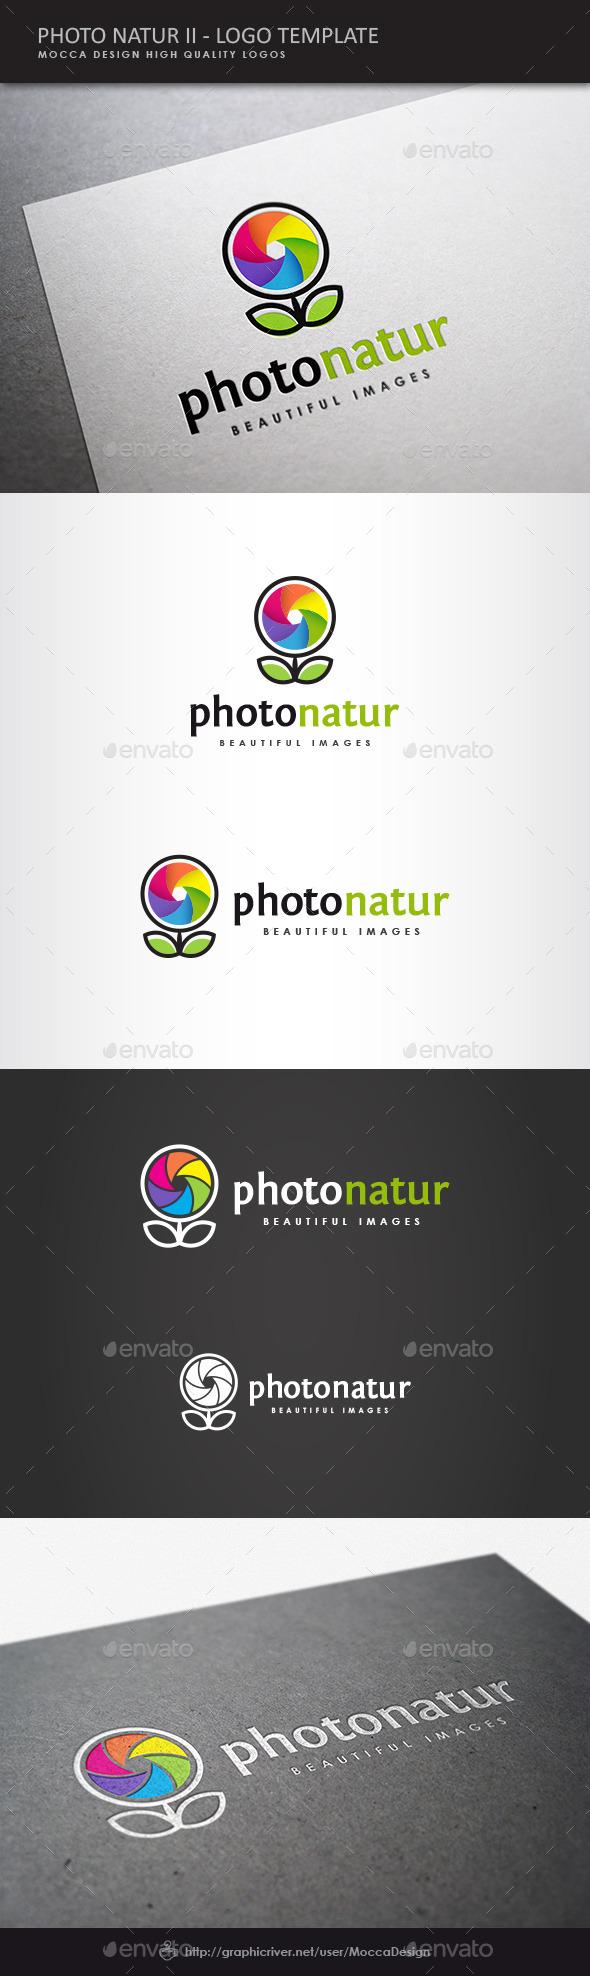 GraphicRiver Photo Natur II Logo 8934923